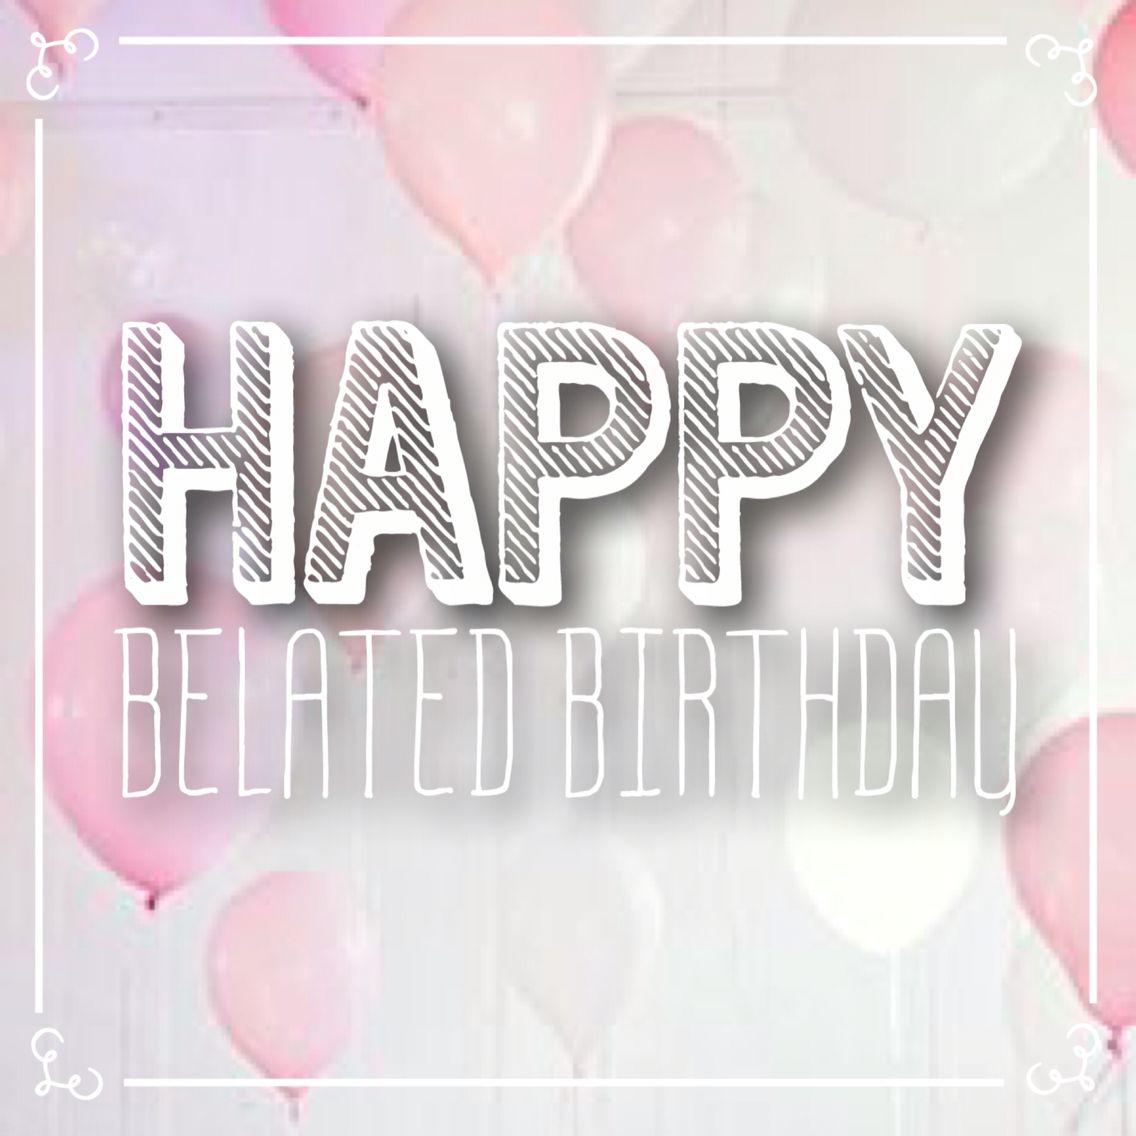 Happy Belated Birthday, Belated Birthday Wishes